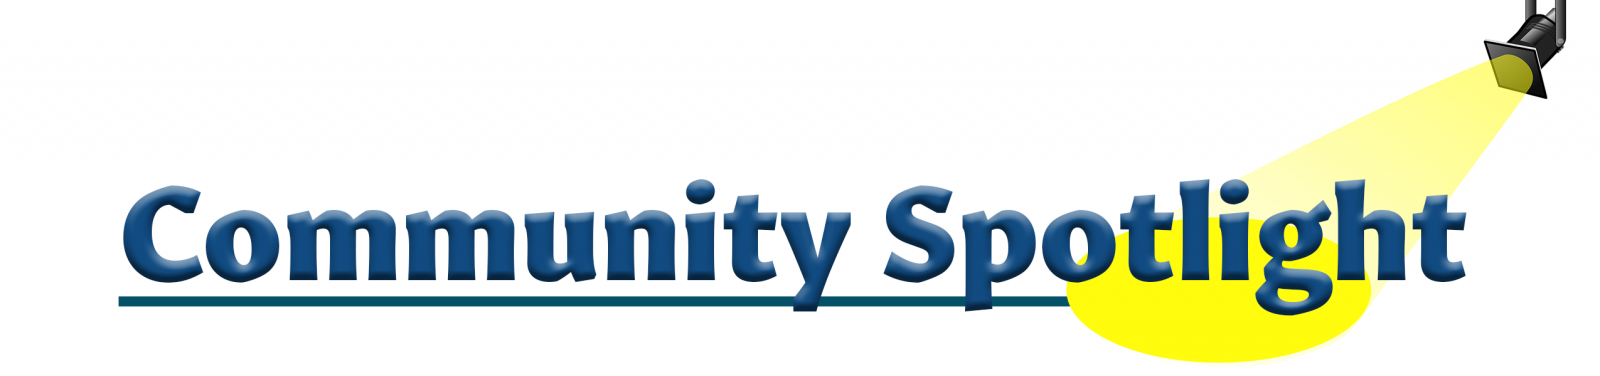 Community Spotlight section header image